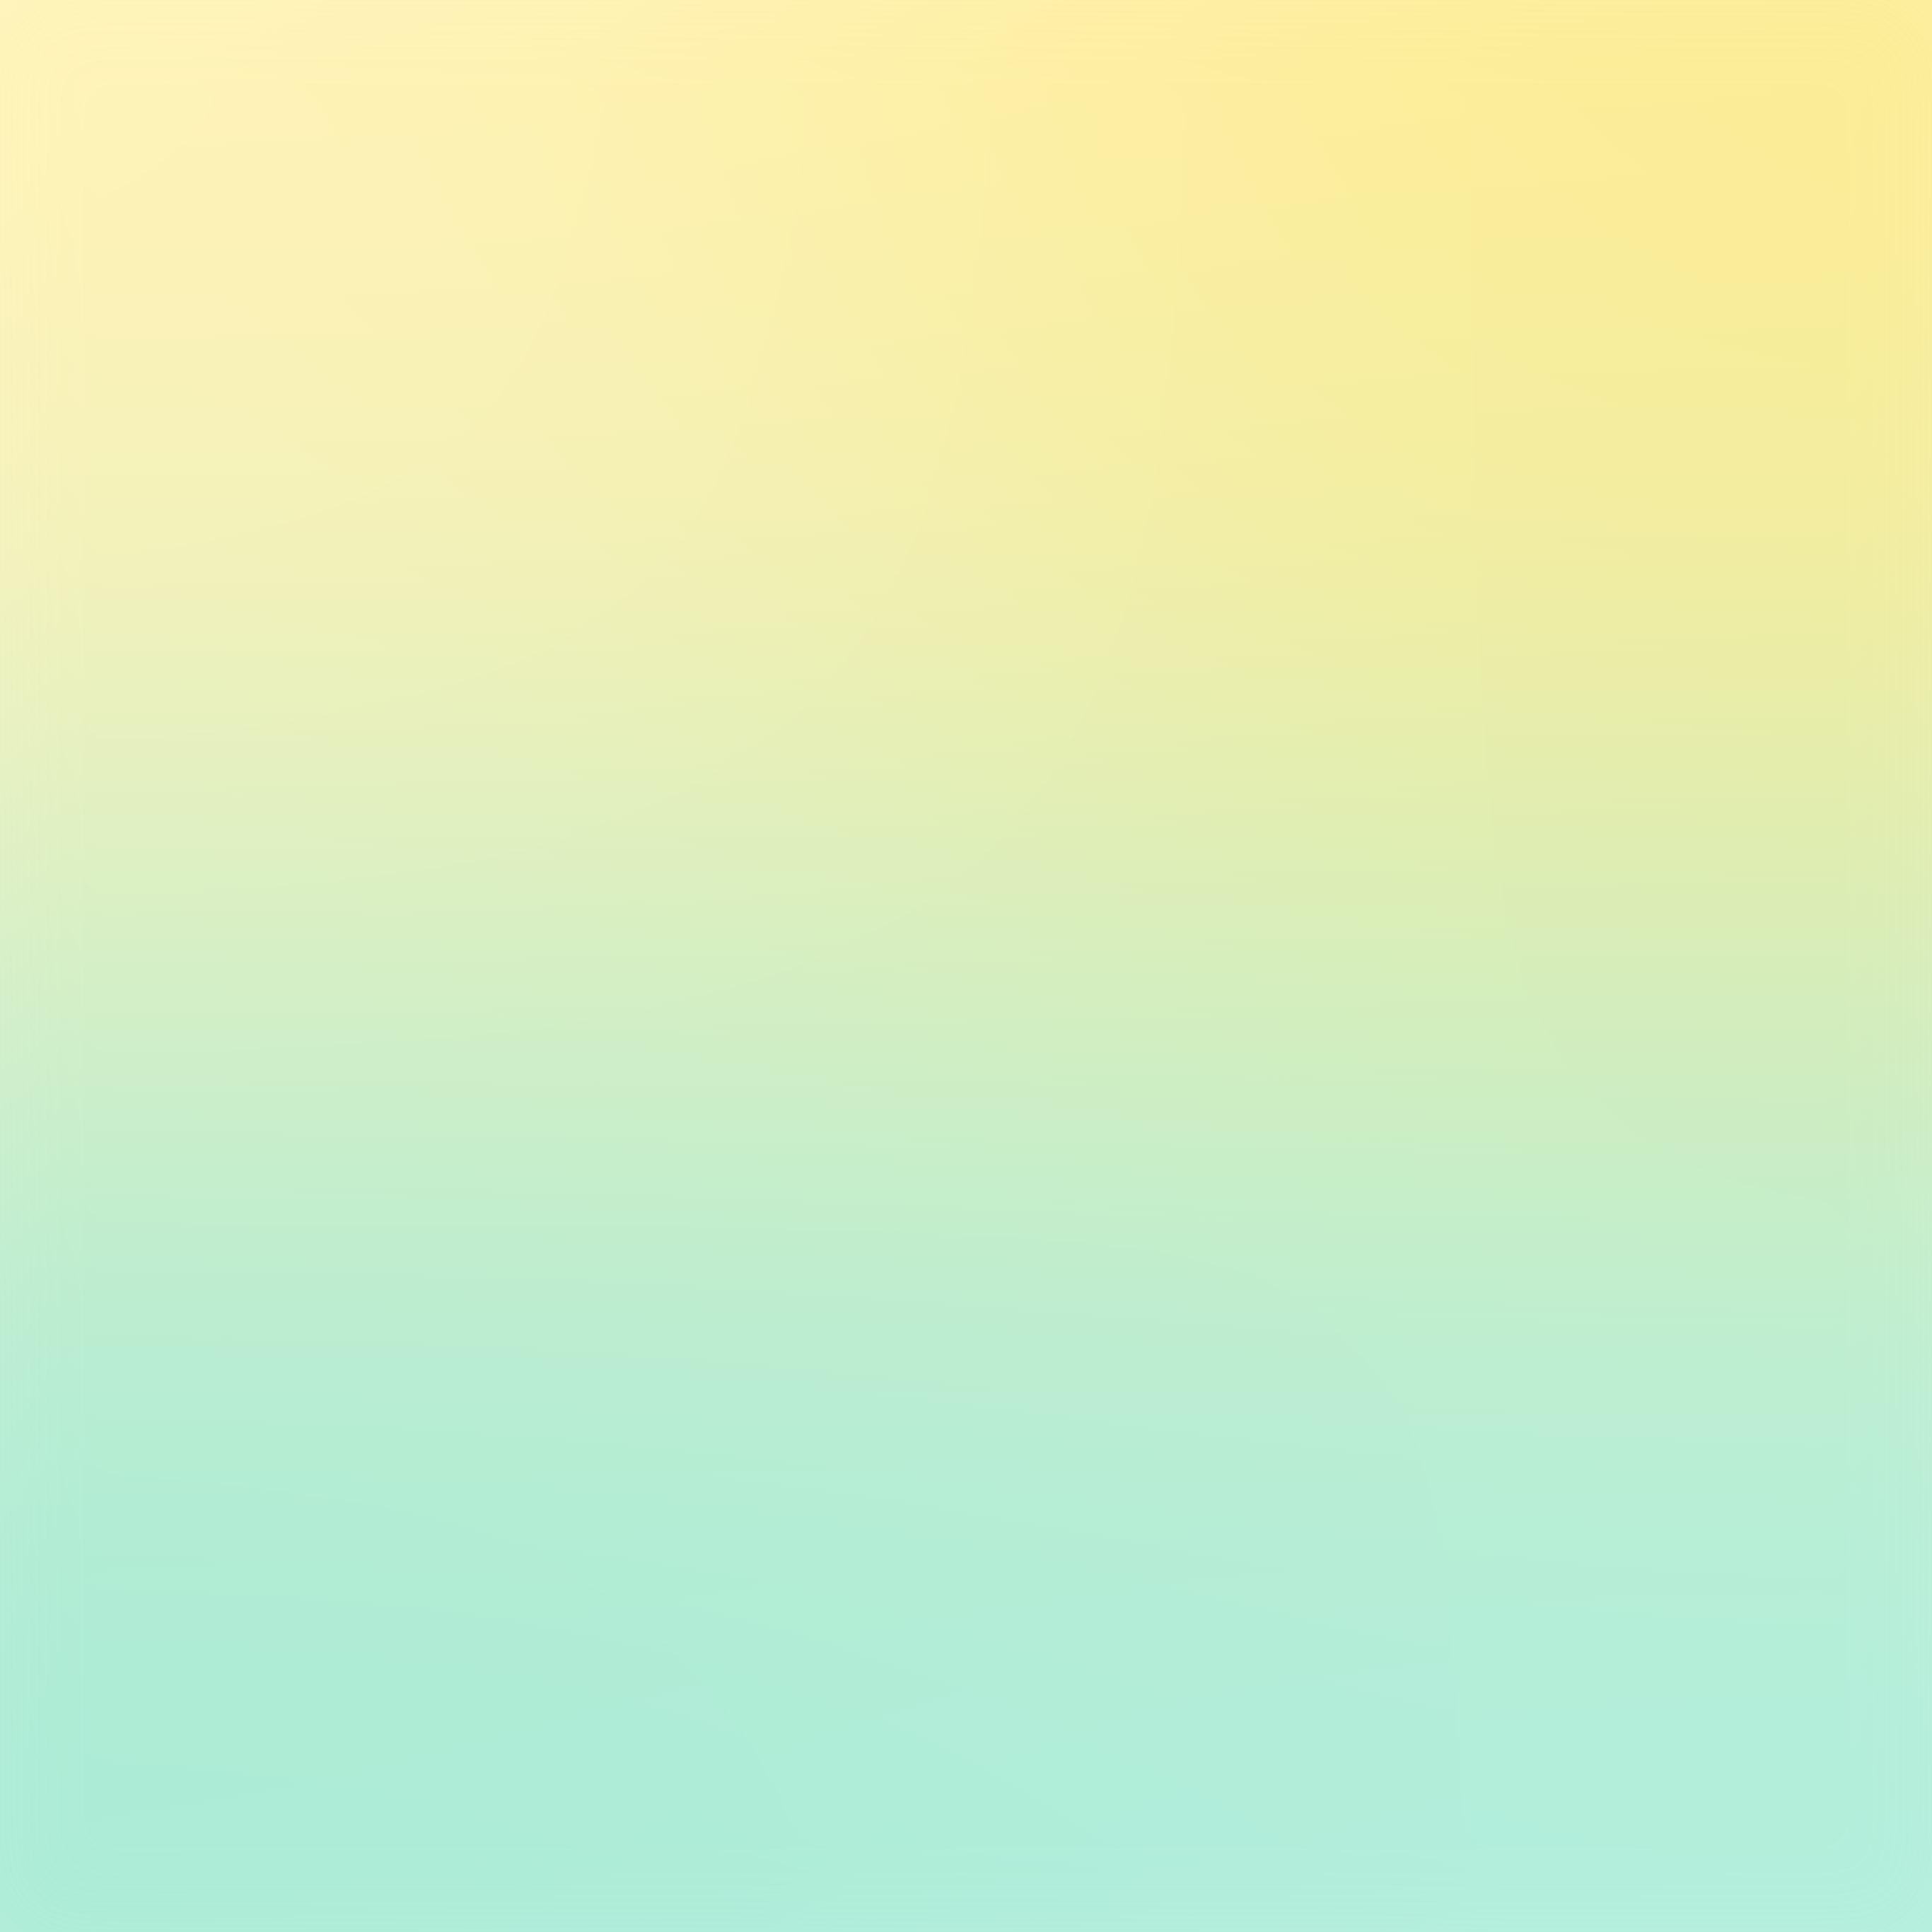 Sl91 Yellow Green Pastel Blur Gradation Wallpaper